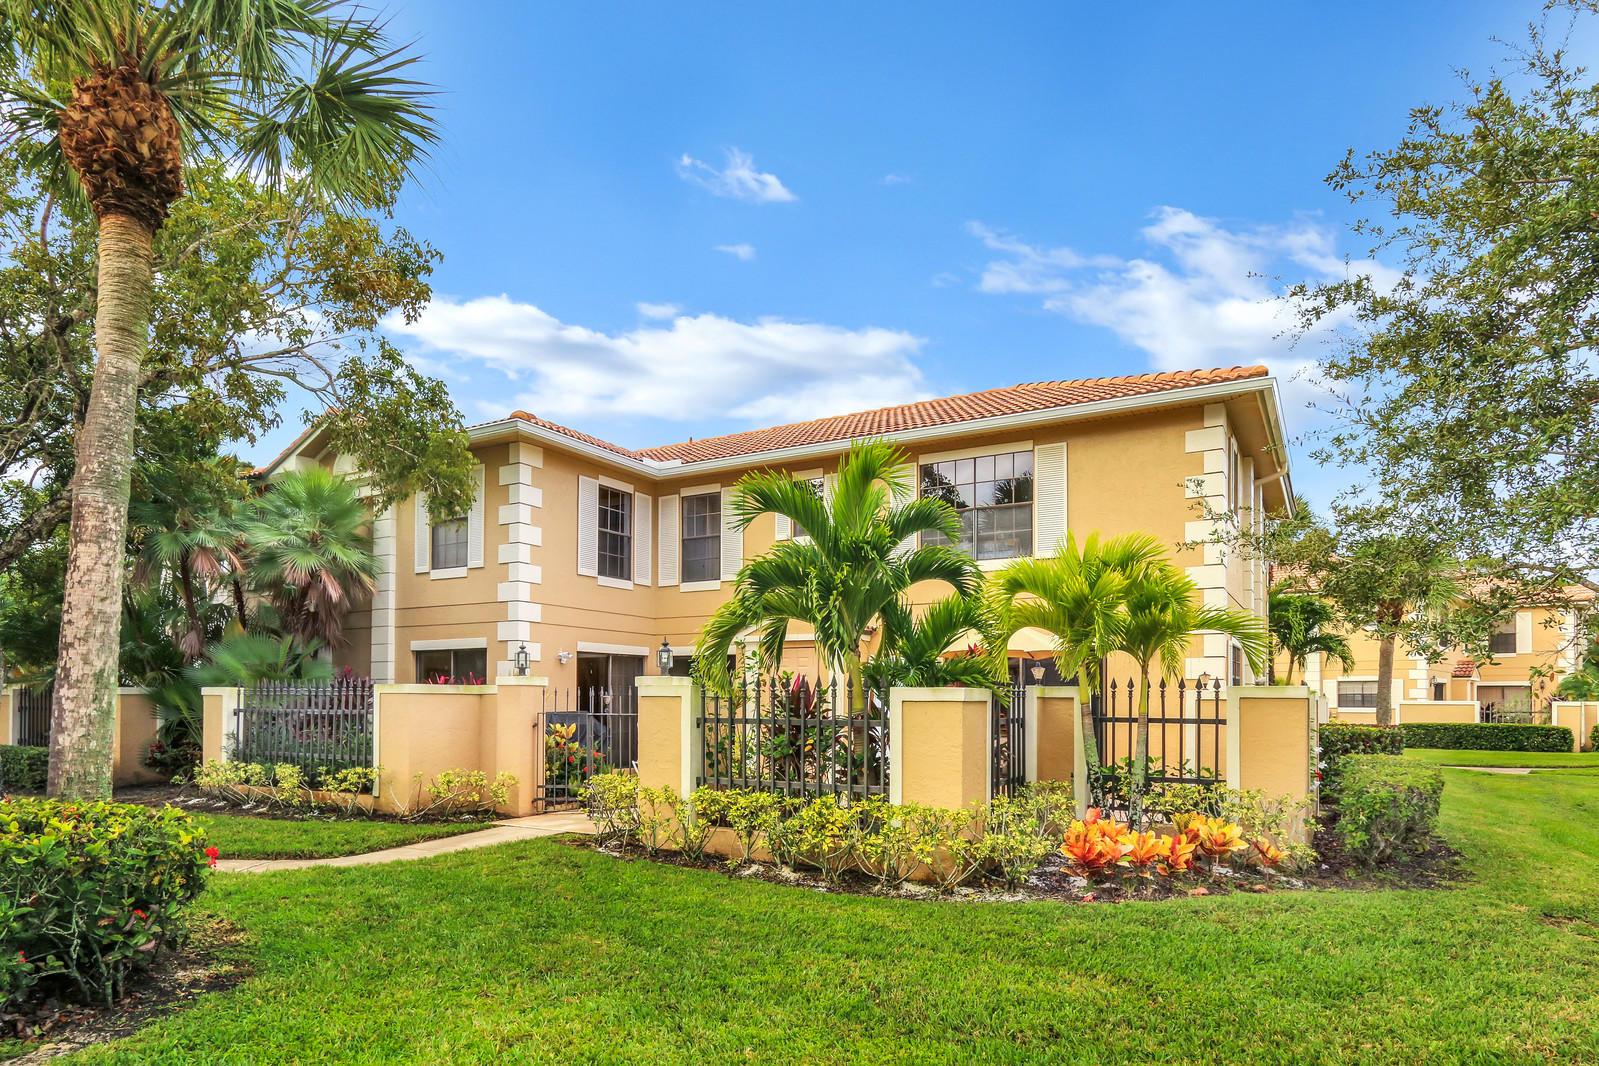 390 Prestwick Circle 1, Palm Beach Gardens, Florida 33418, 3 Bedrooms Bedrooms, ,3 BathroomsBathrooms,F,Townhouse,Prestwick,RX-10482819